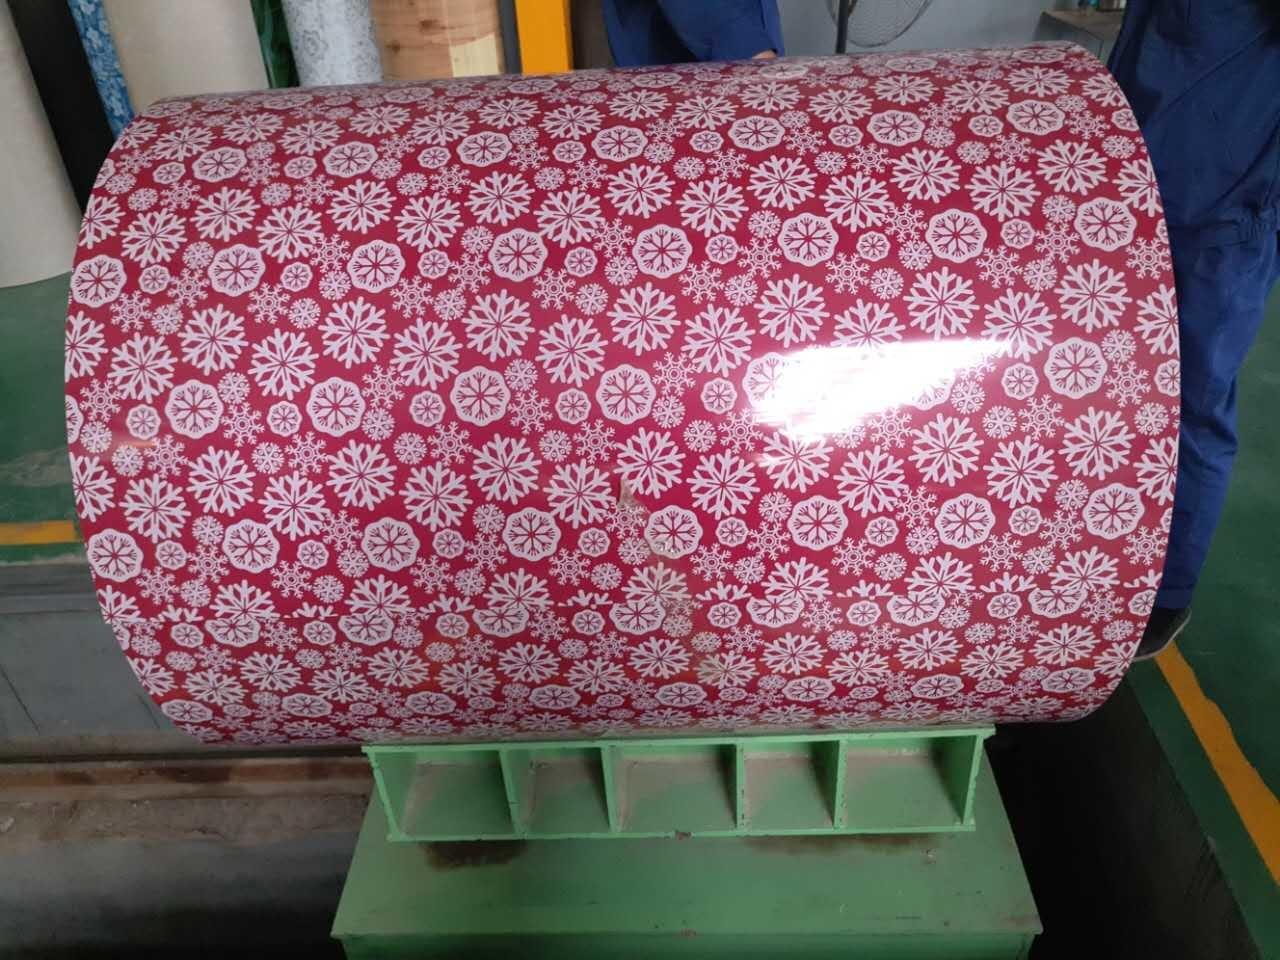 PPGI Color Coated Steel Coil Prepainted Galvanized Steel Coil Colorful steel Coil